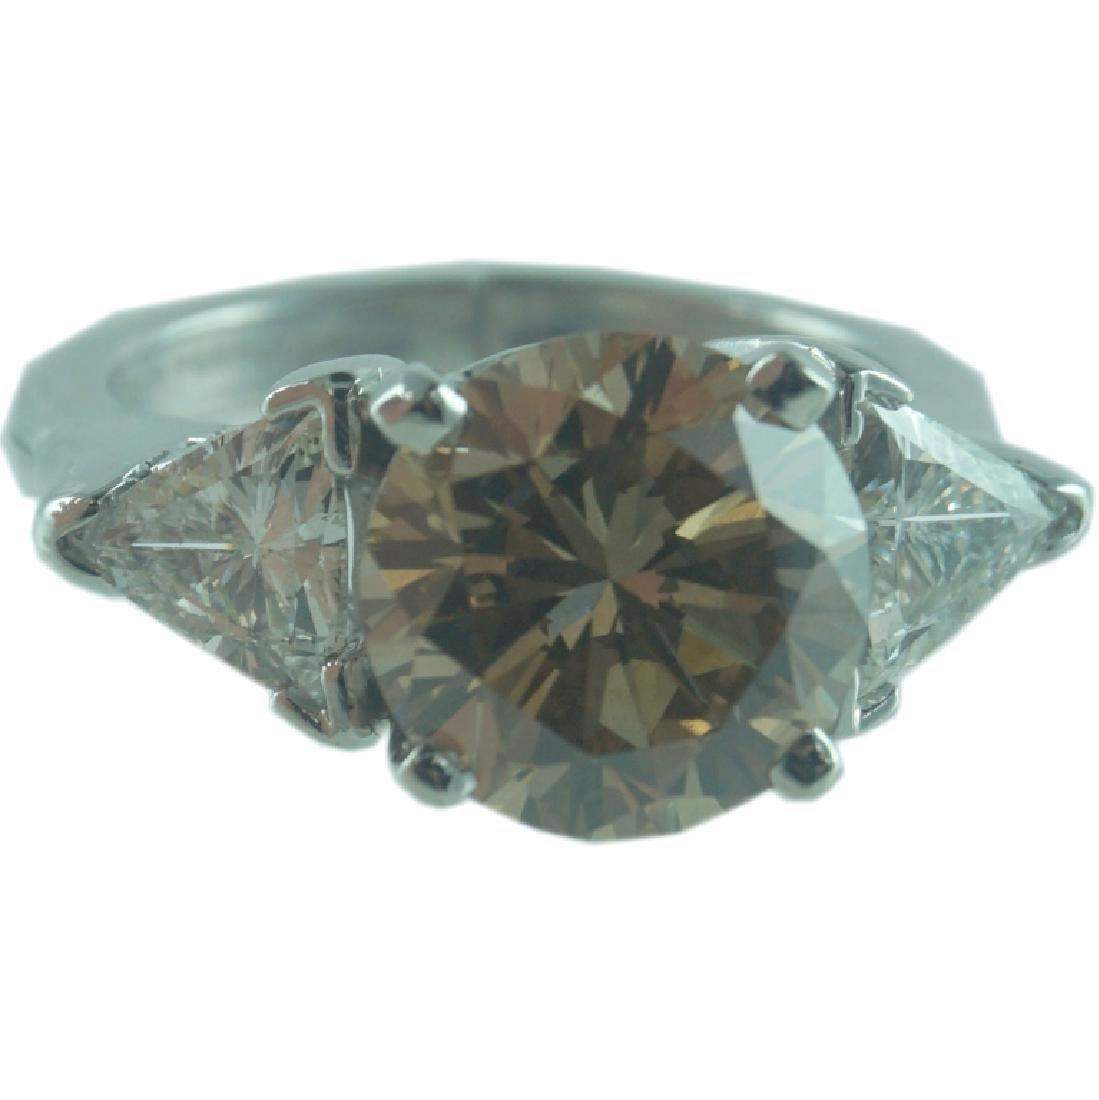 GIA Certified, 3.33 Fancy Yellowish Brown Diamond